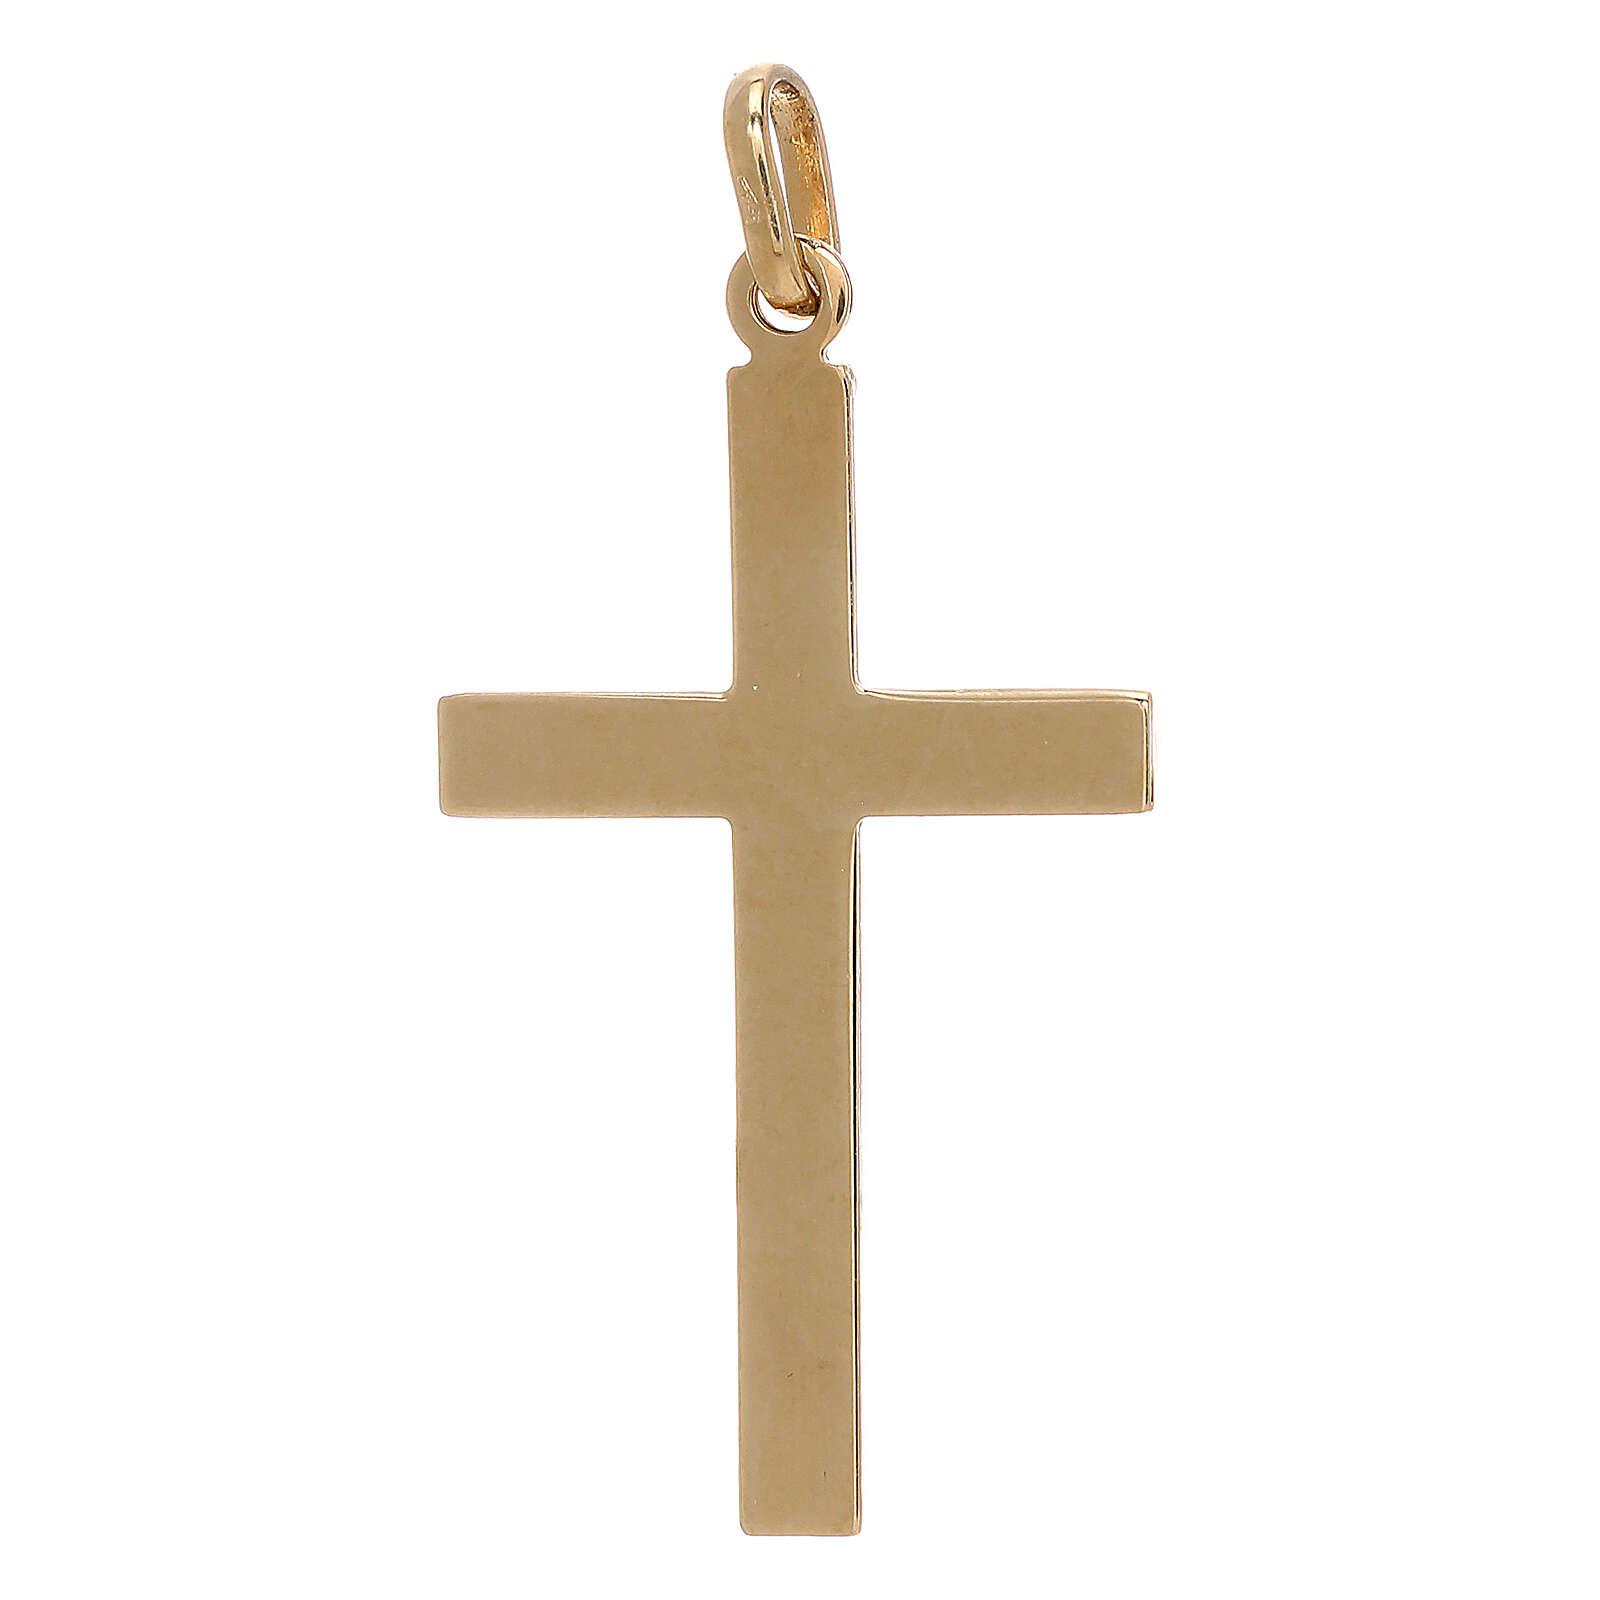 Cross pendant net pattern bicolor 18-carat gold 1.15 gr 4